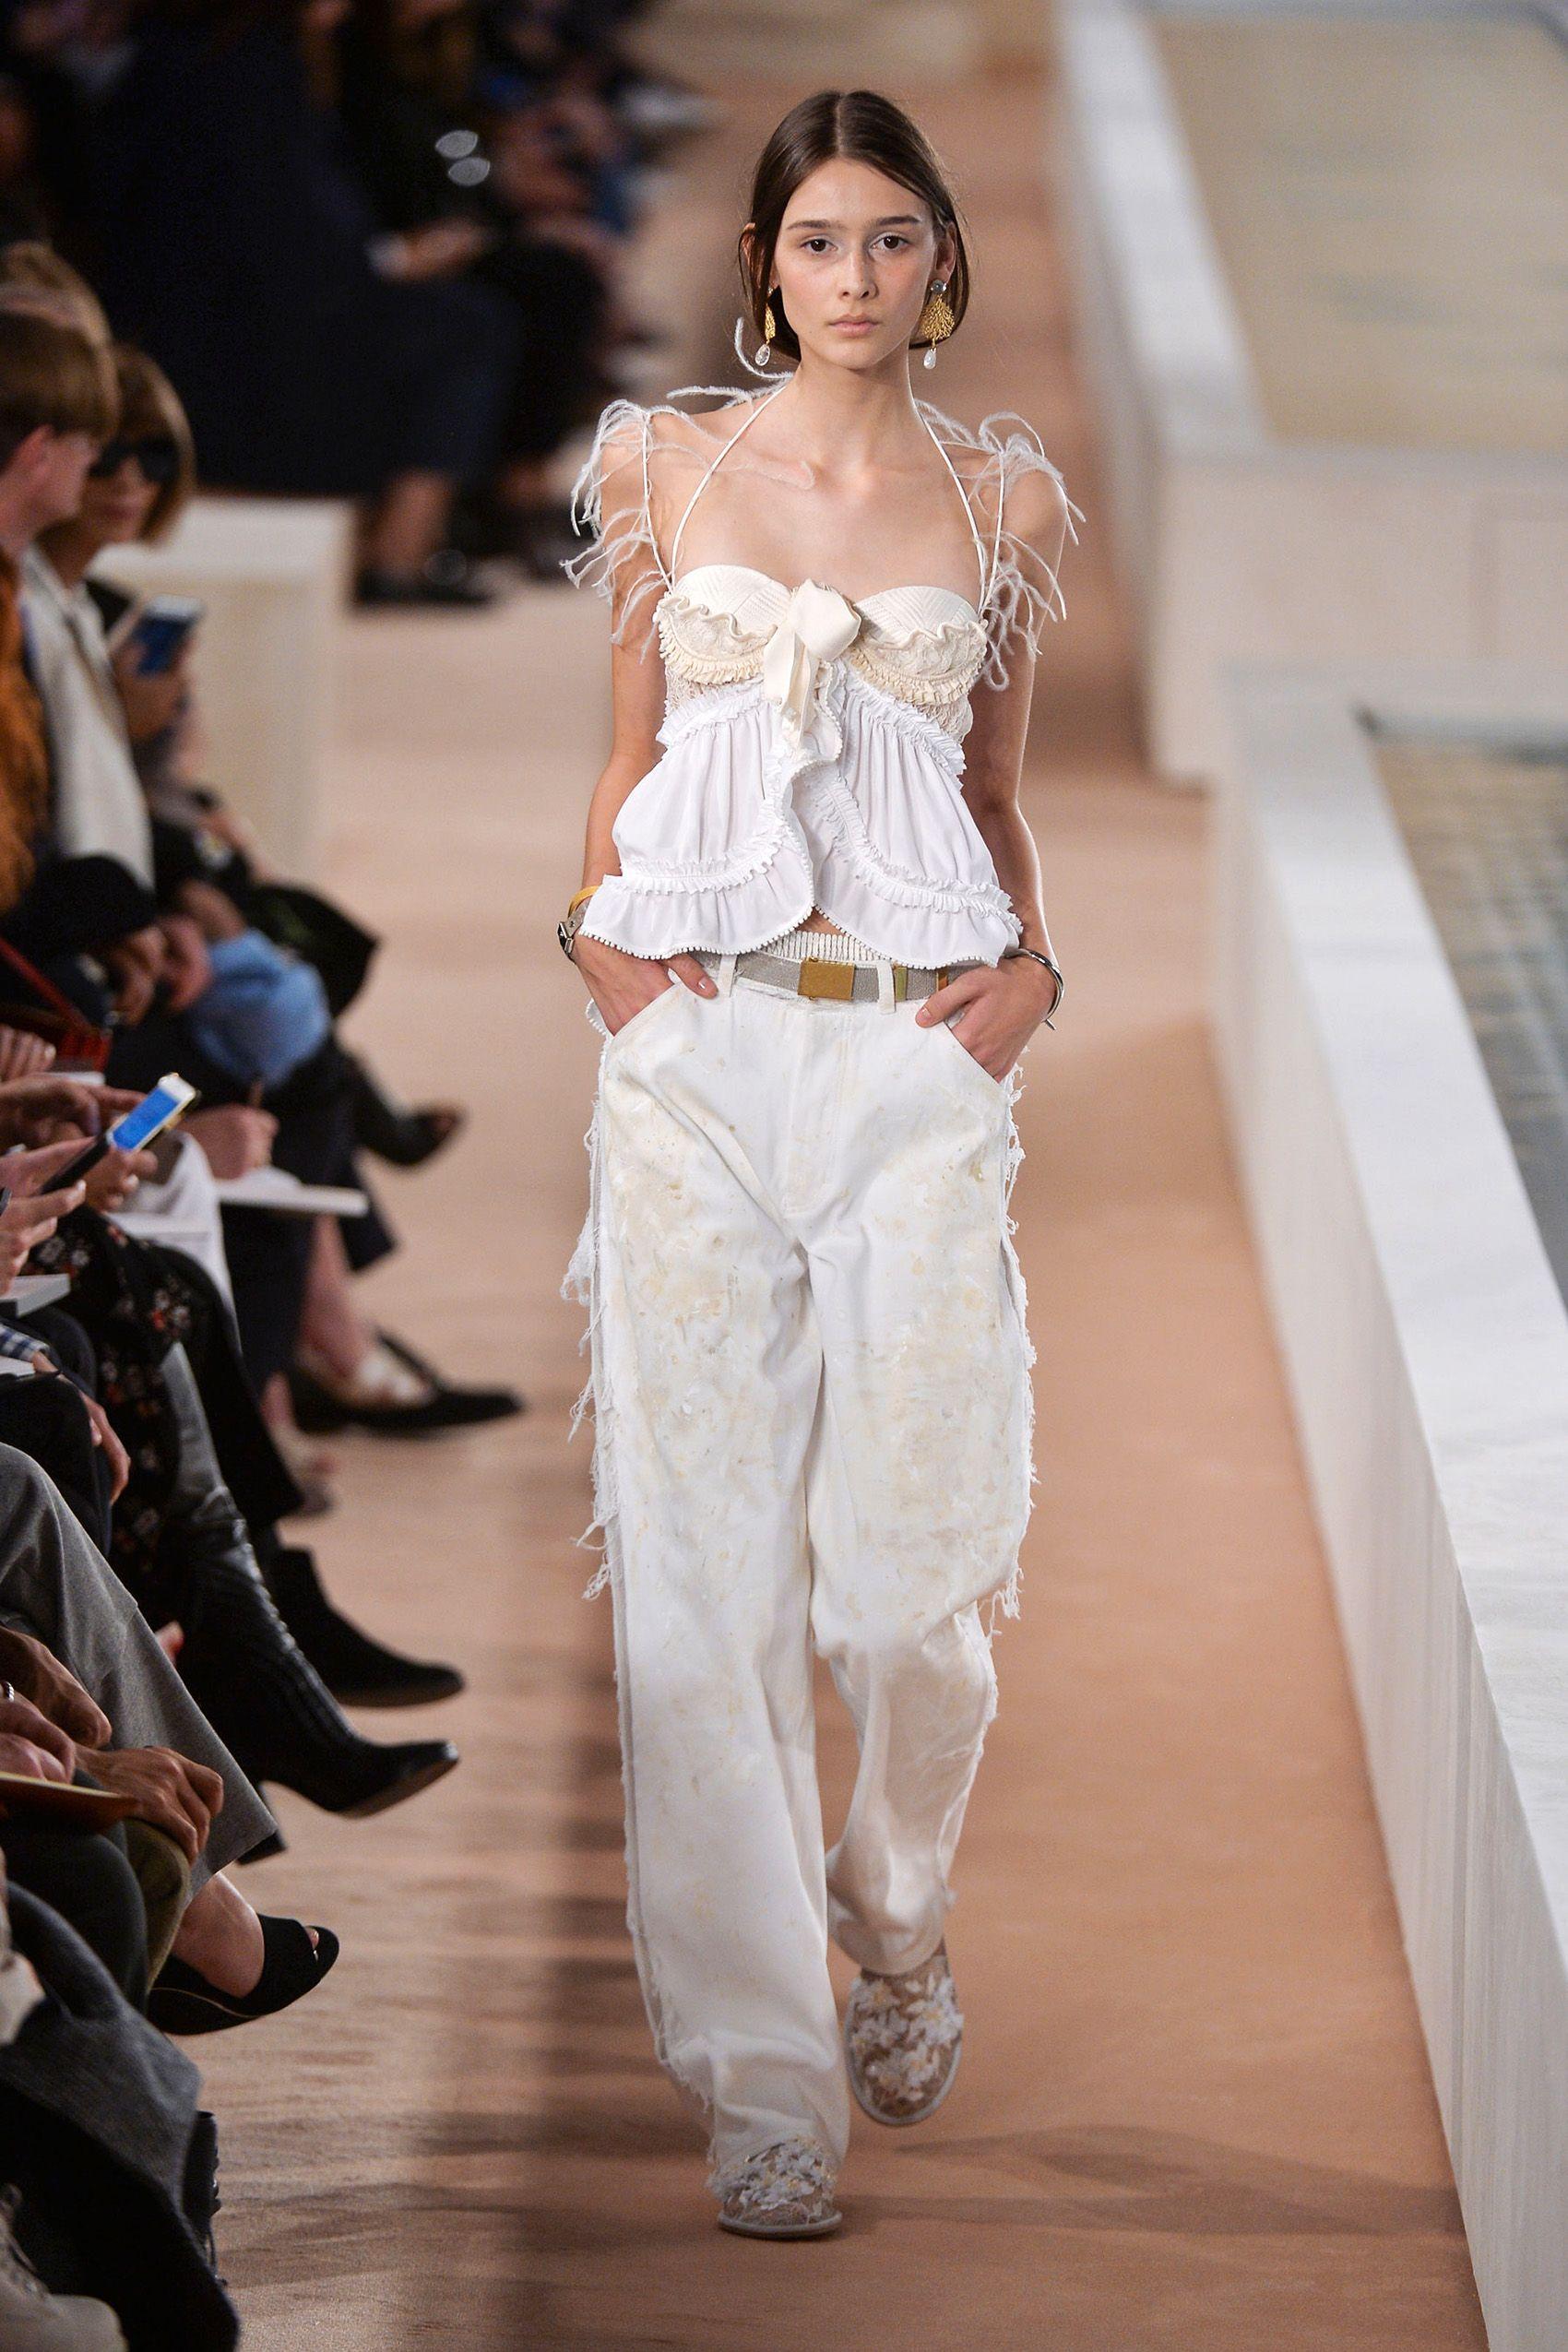 Best Runway Fashion at Paris Fashion Week Spring 2016 - Paris Fashion Week  Spring 2016 Runway Trends 6134770e47794